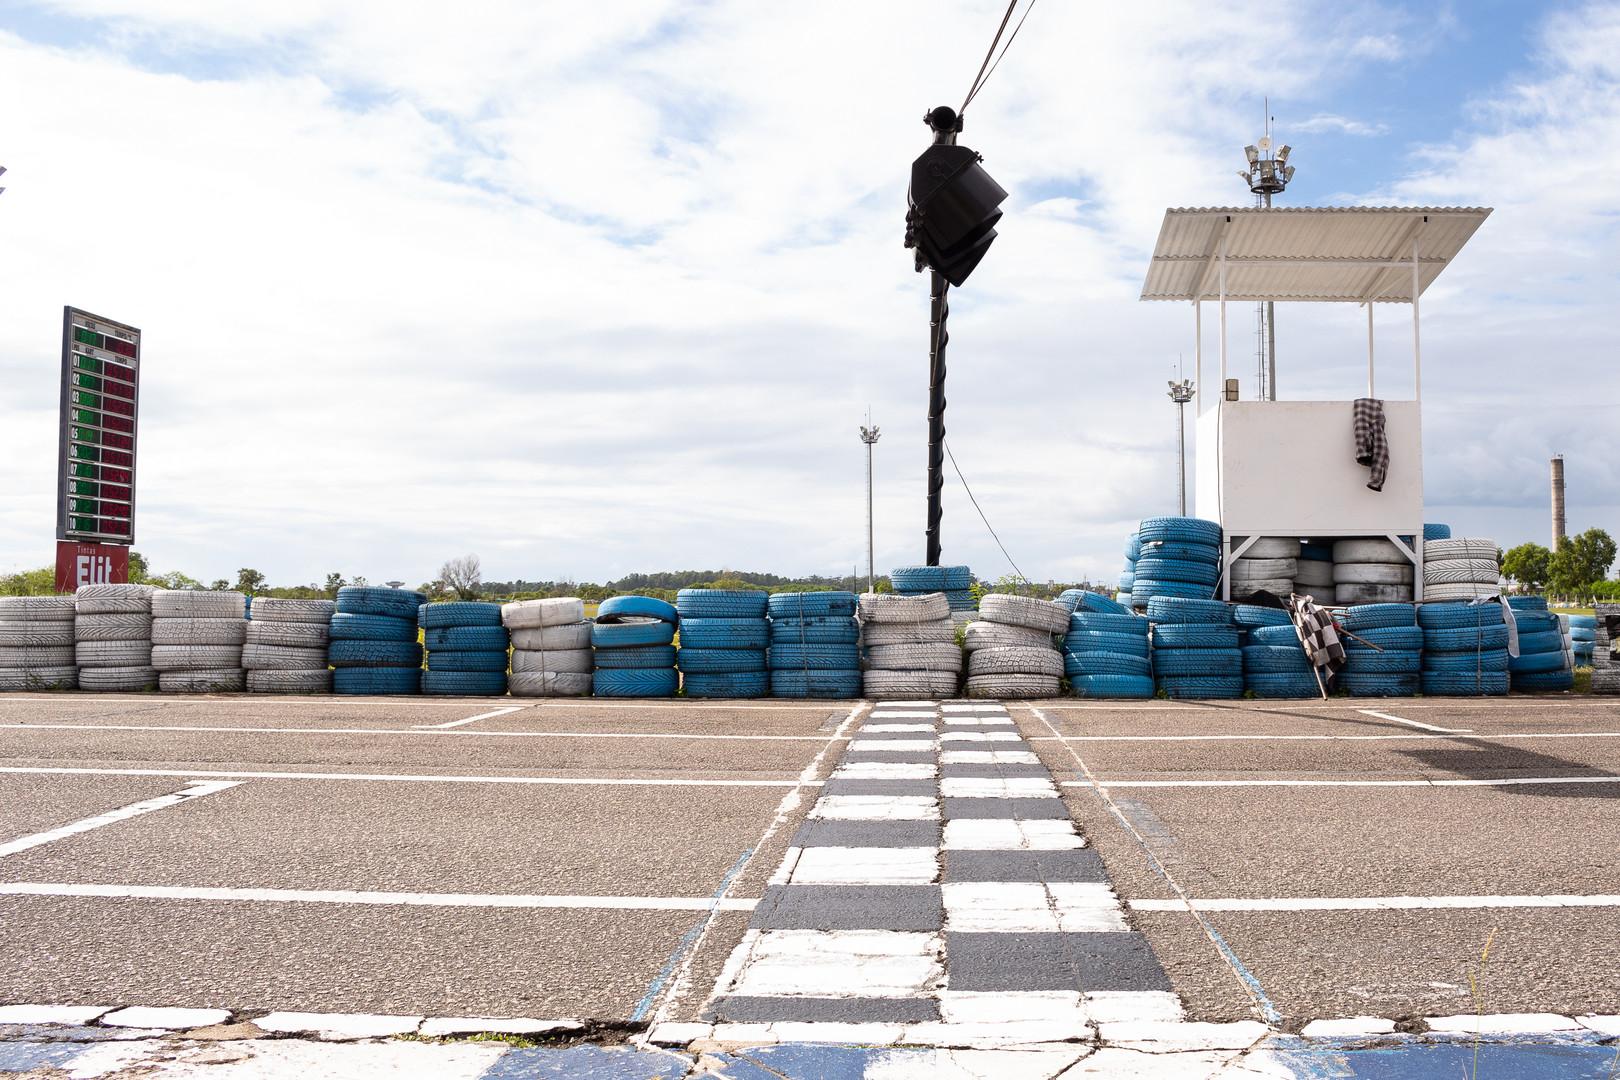 Kartódromo Internacional da Serra